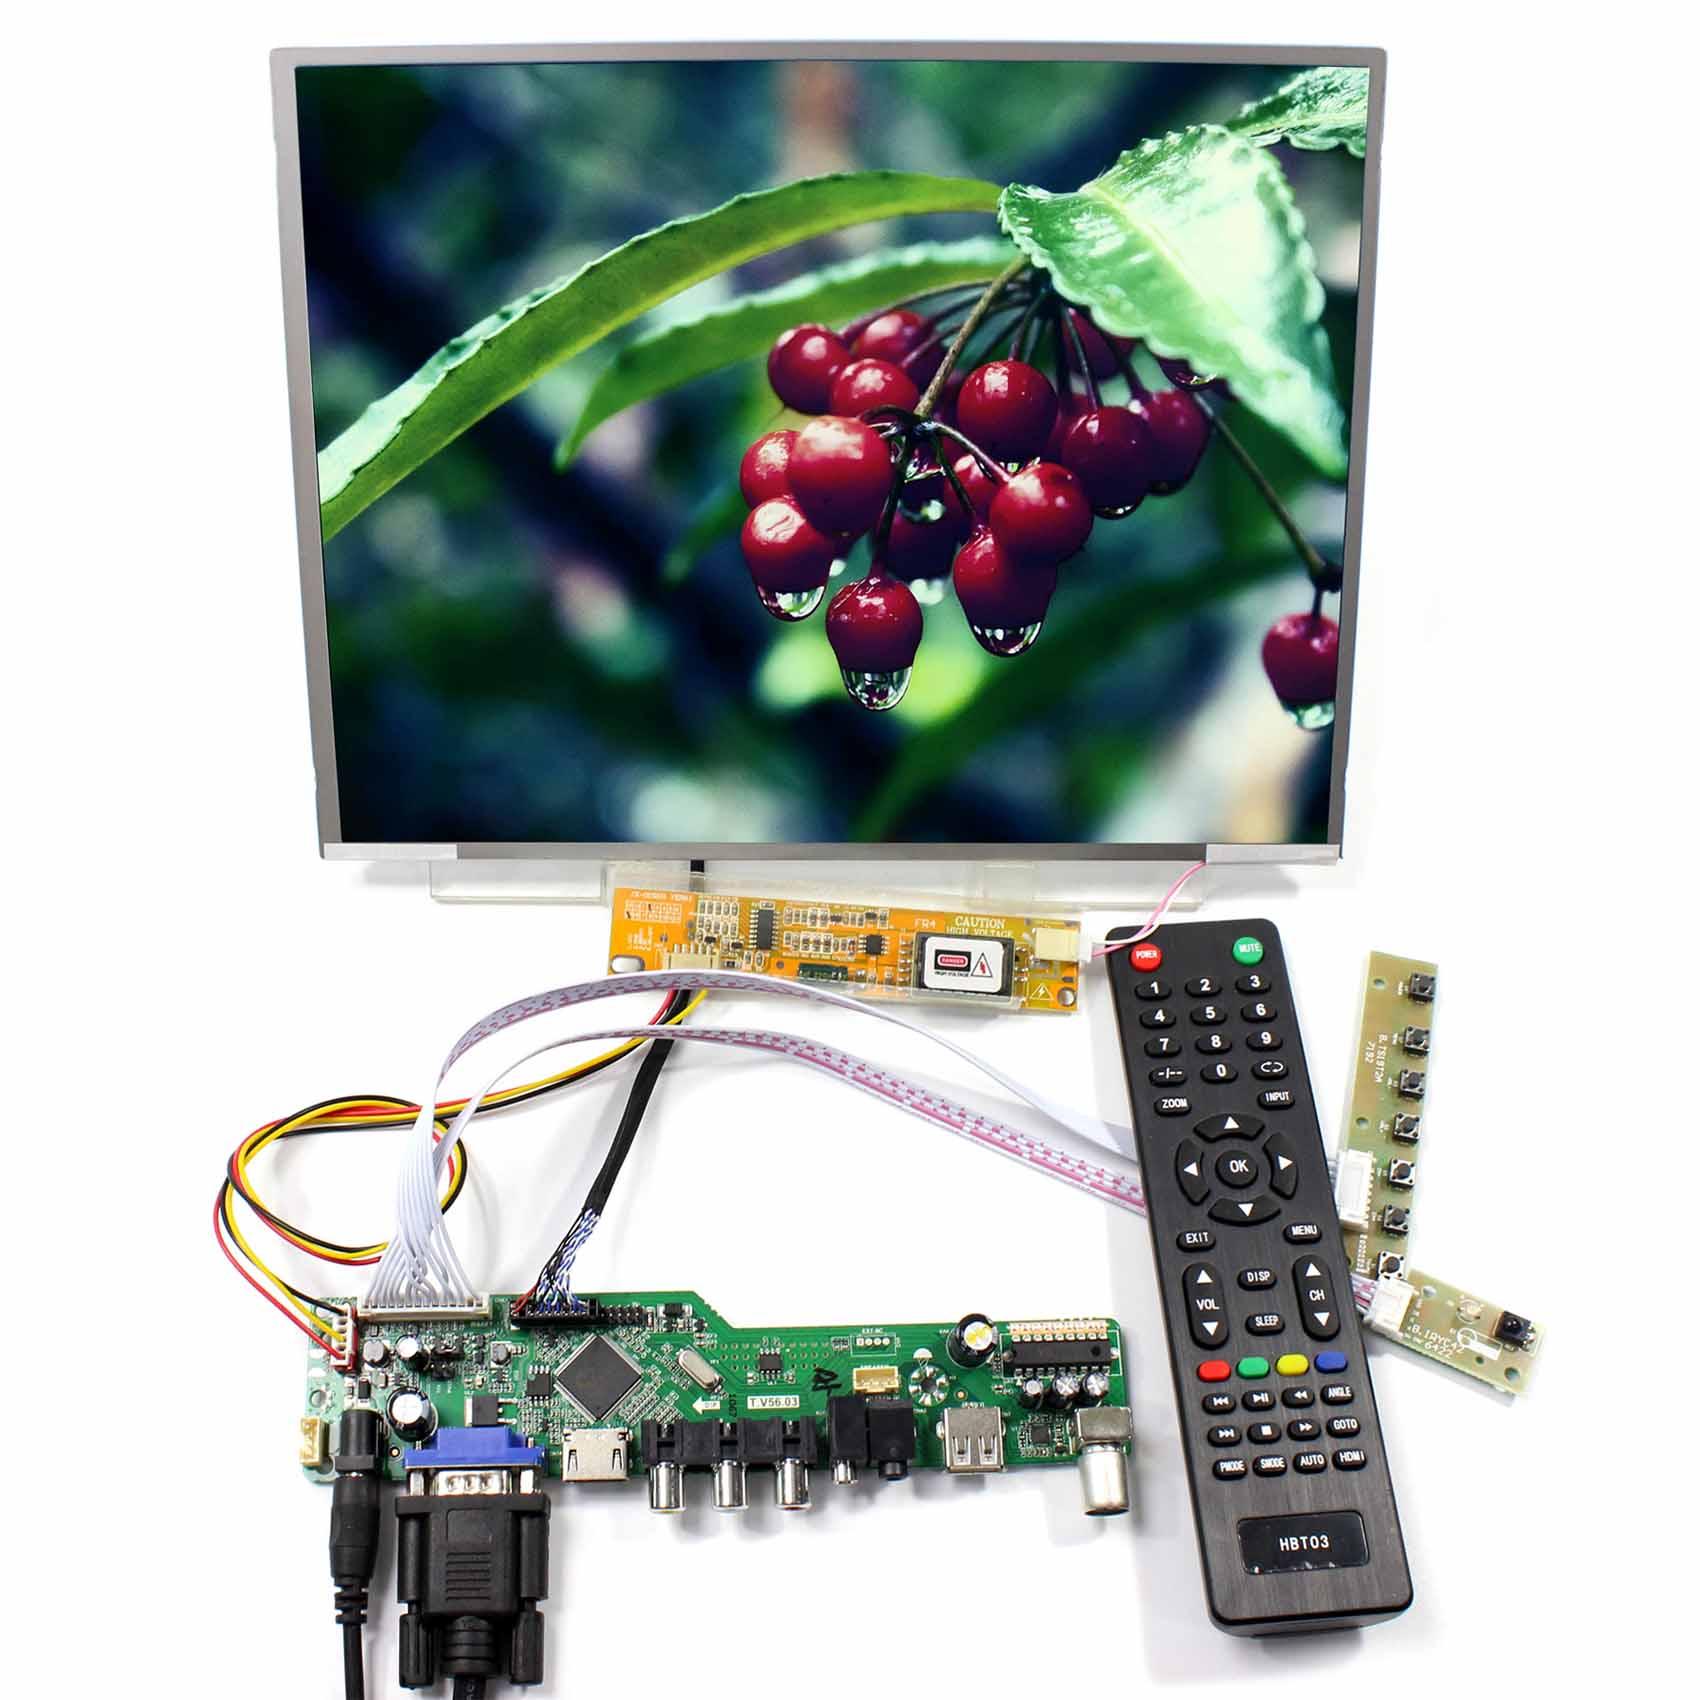 "Display Control HDMI VGA AV USB Board LCD Controller Board With 12.1"" LTN121XT LCD Display 1024x768"